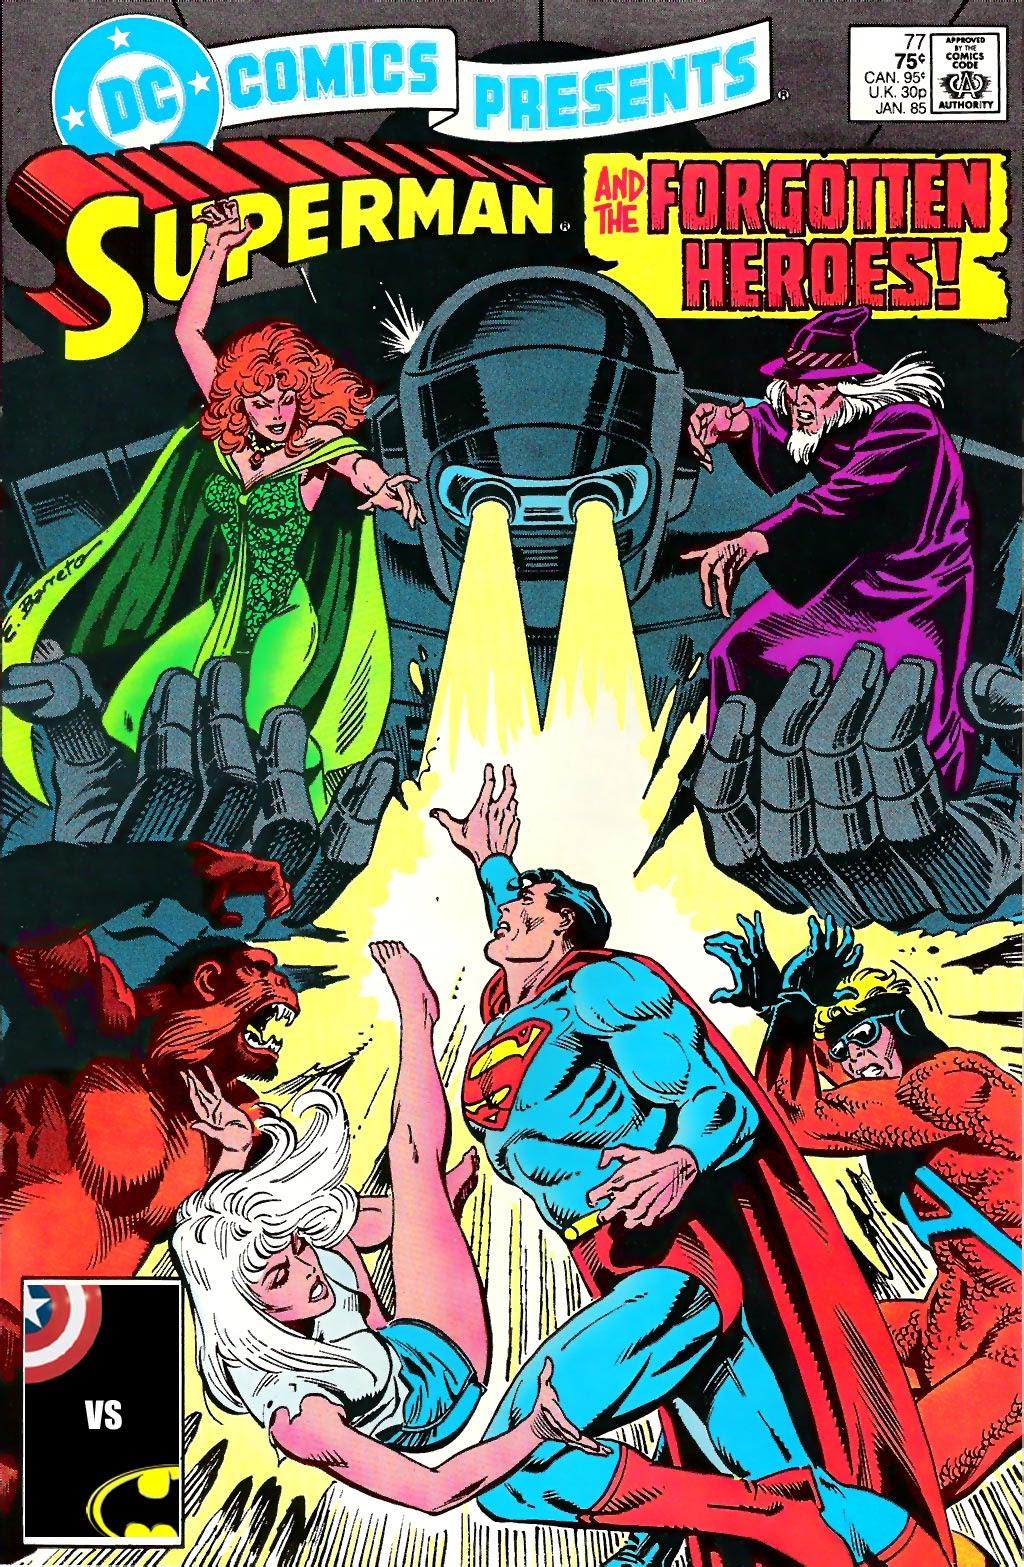 DC Comics Presents (1978) 77 Page 1